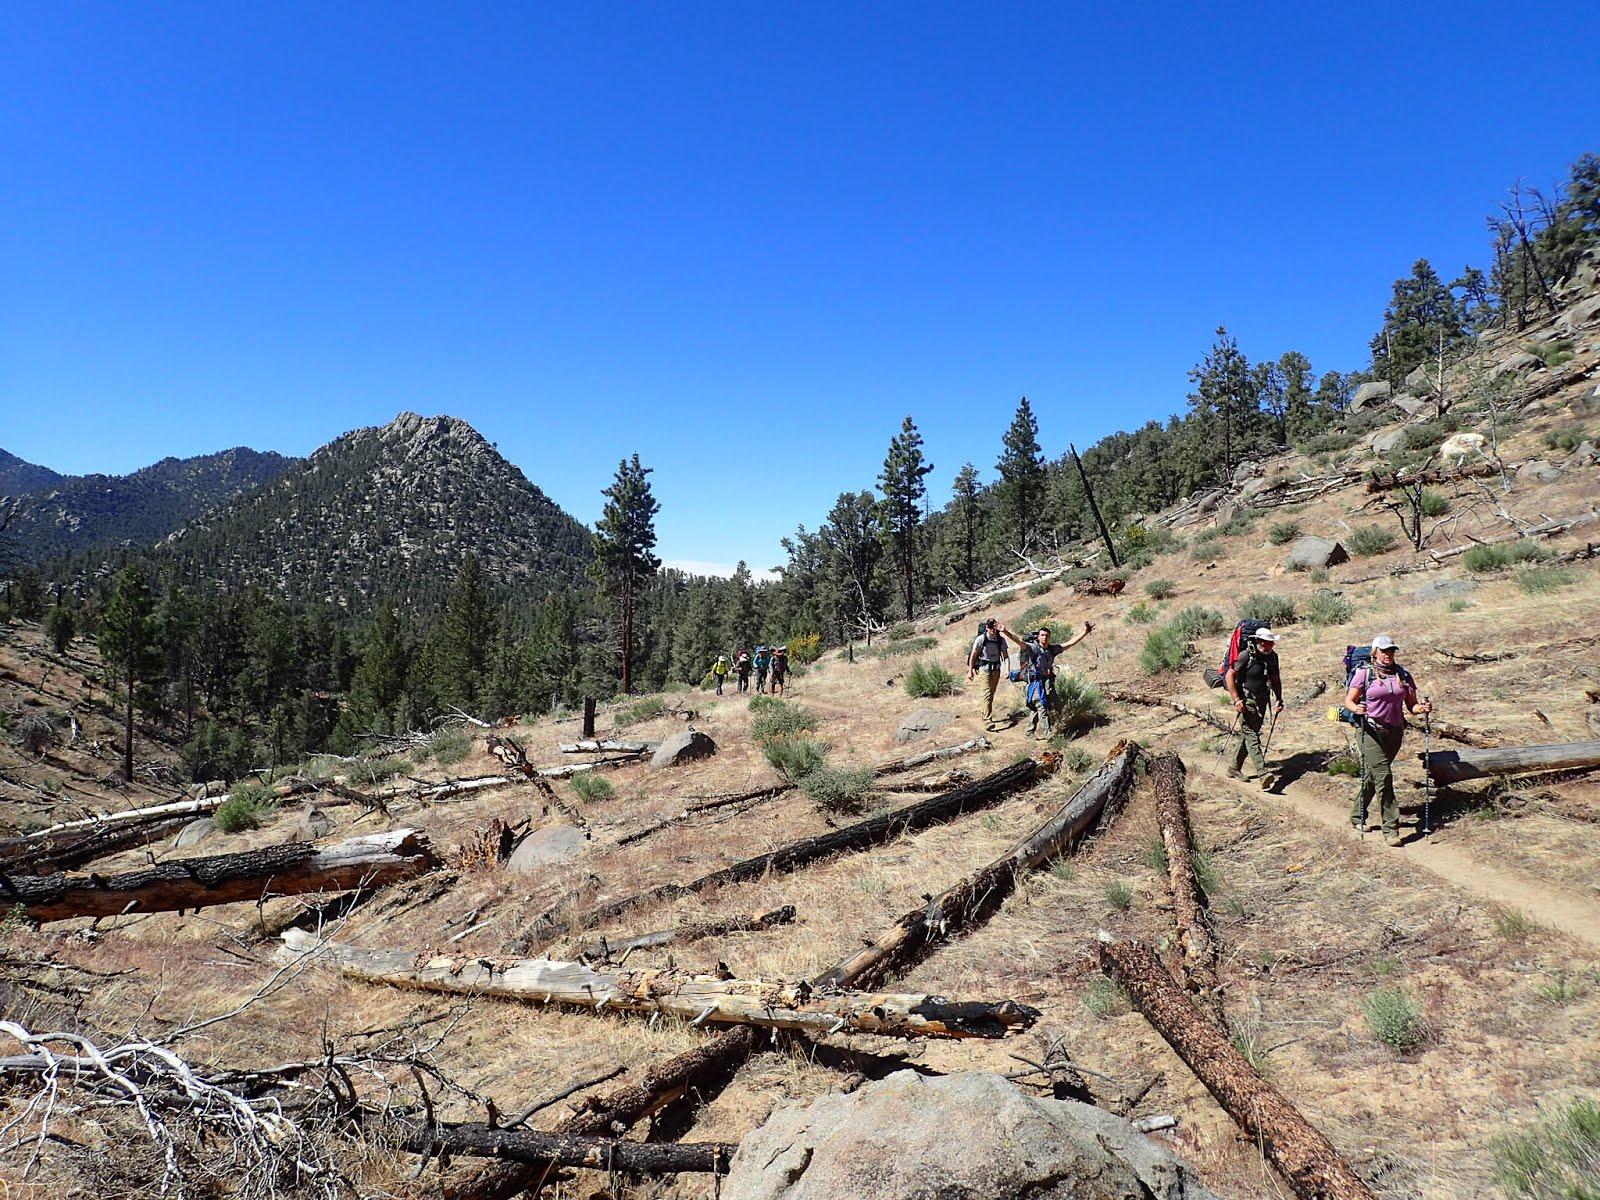 kennedy canyon trail